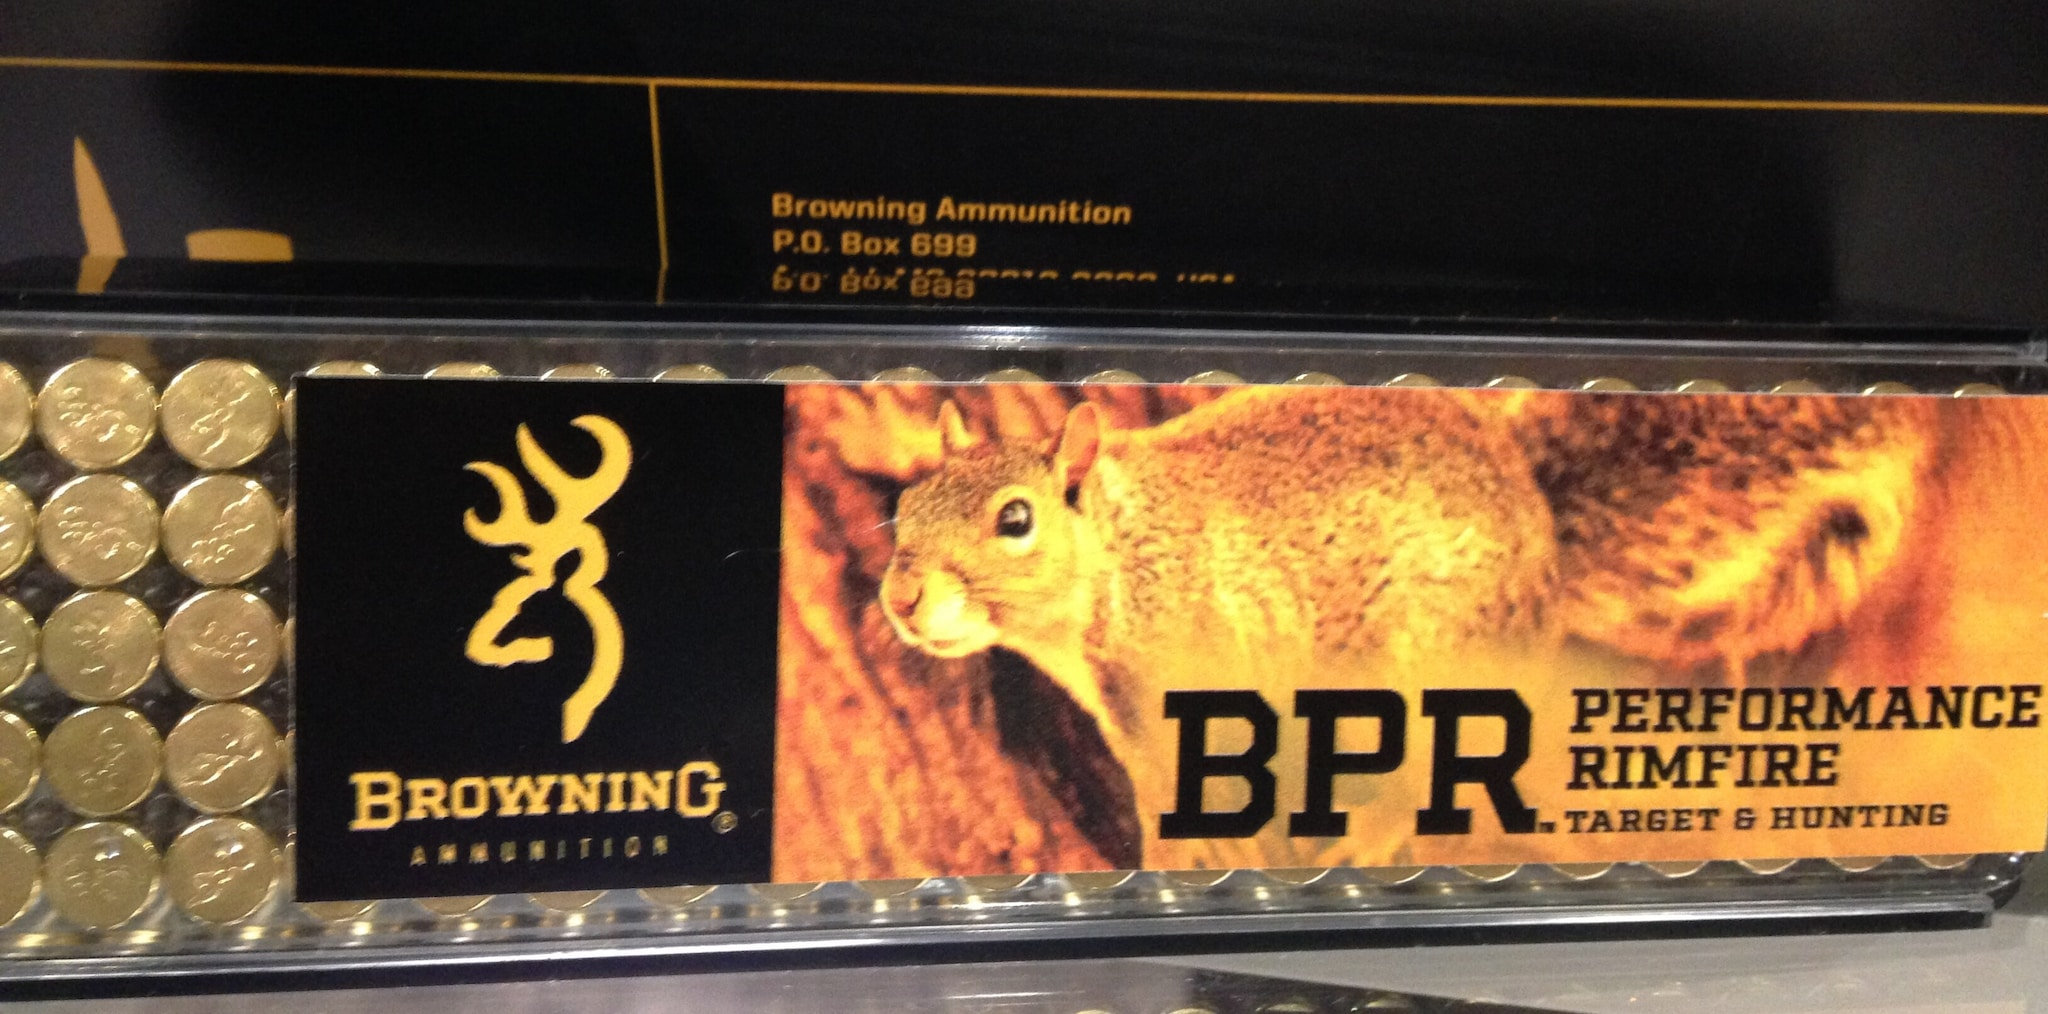 Browning .22